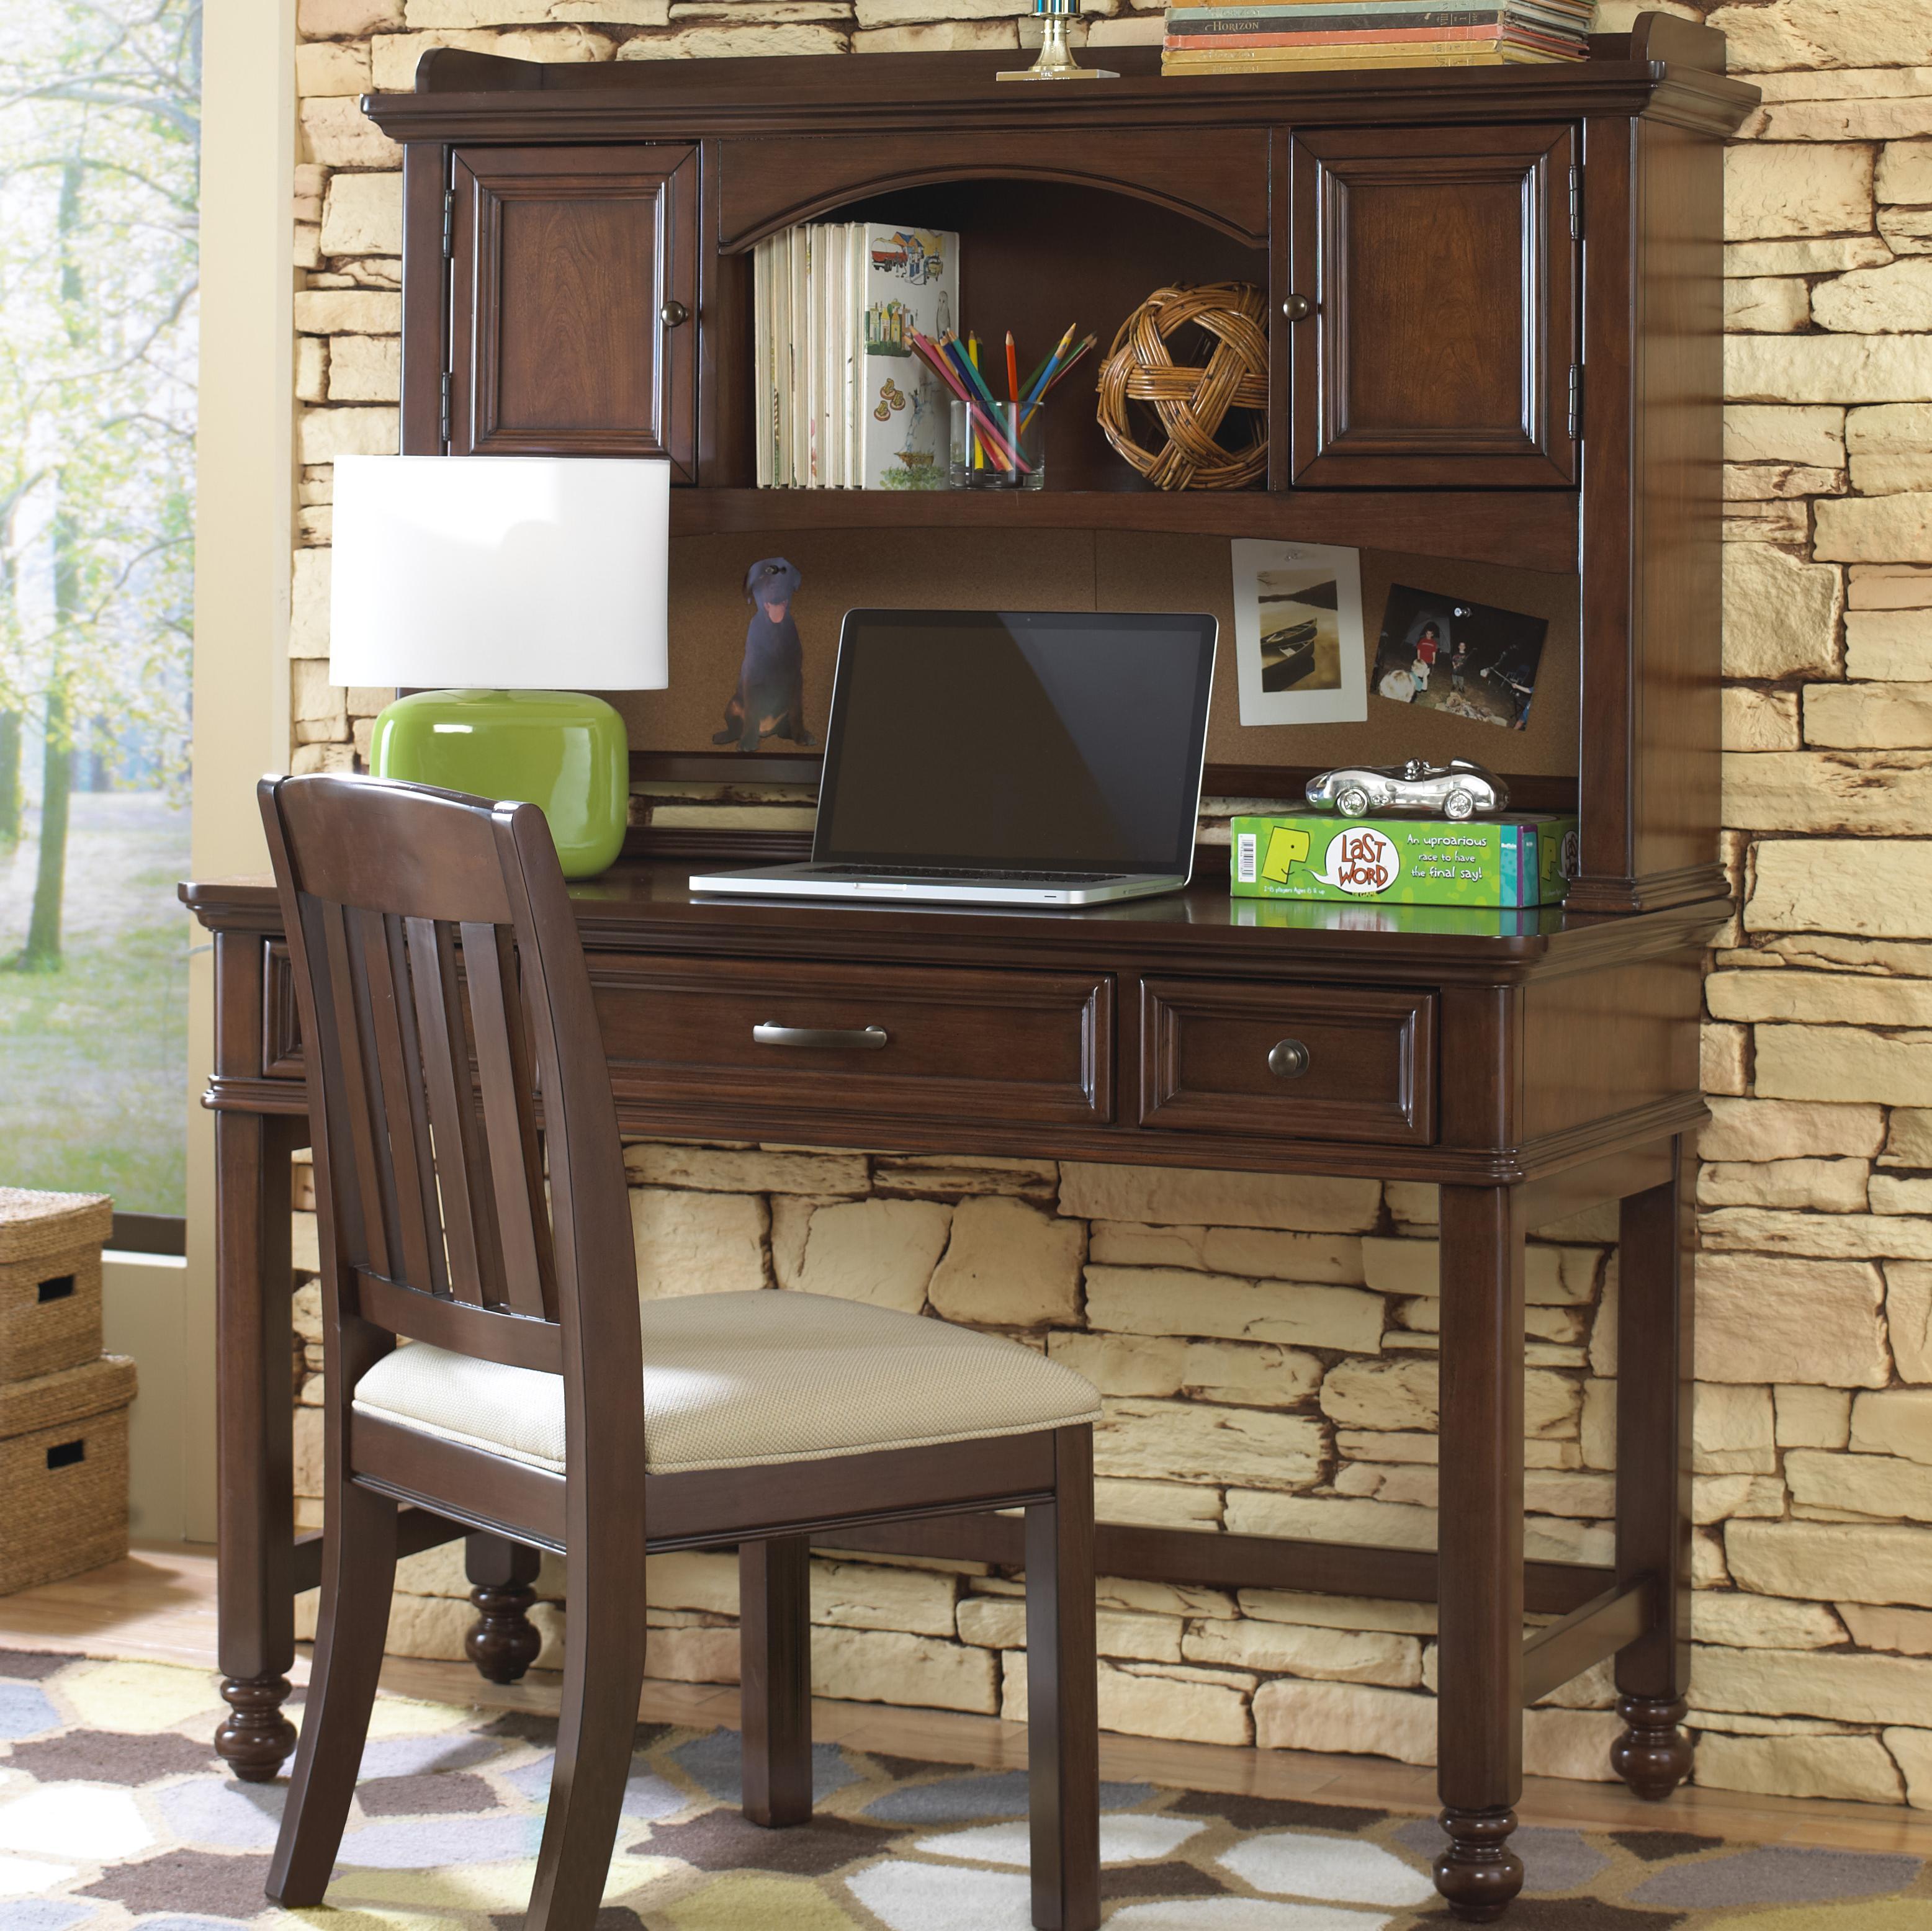 Kidz Gear Griffin Desk with Hutch - Item Number: 8468-414+453